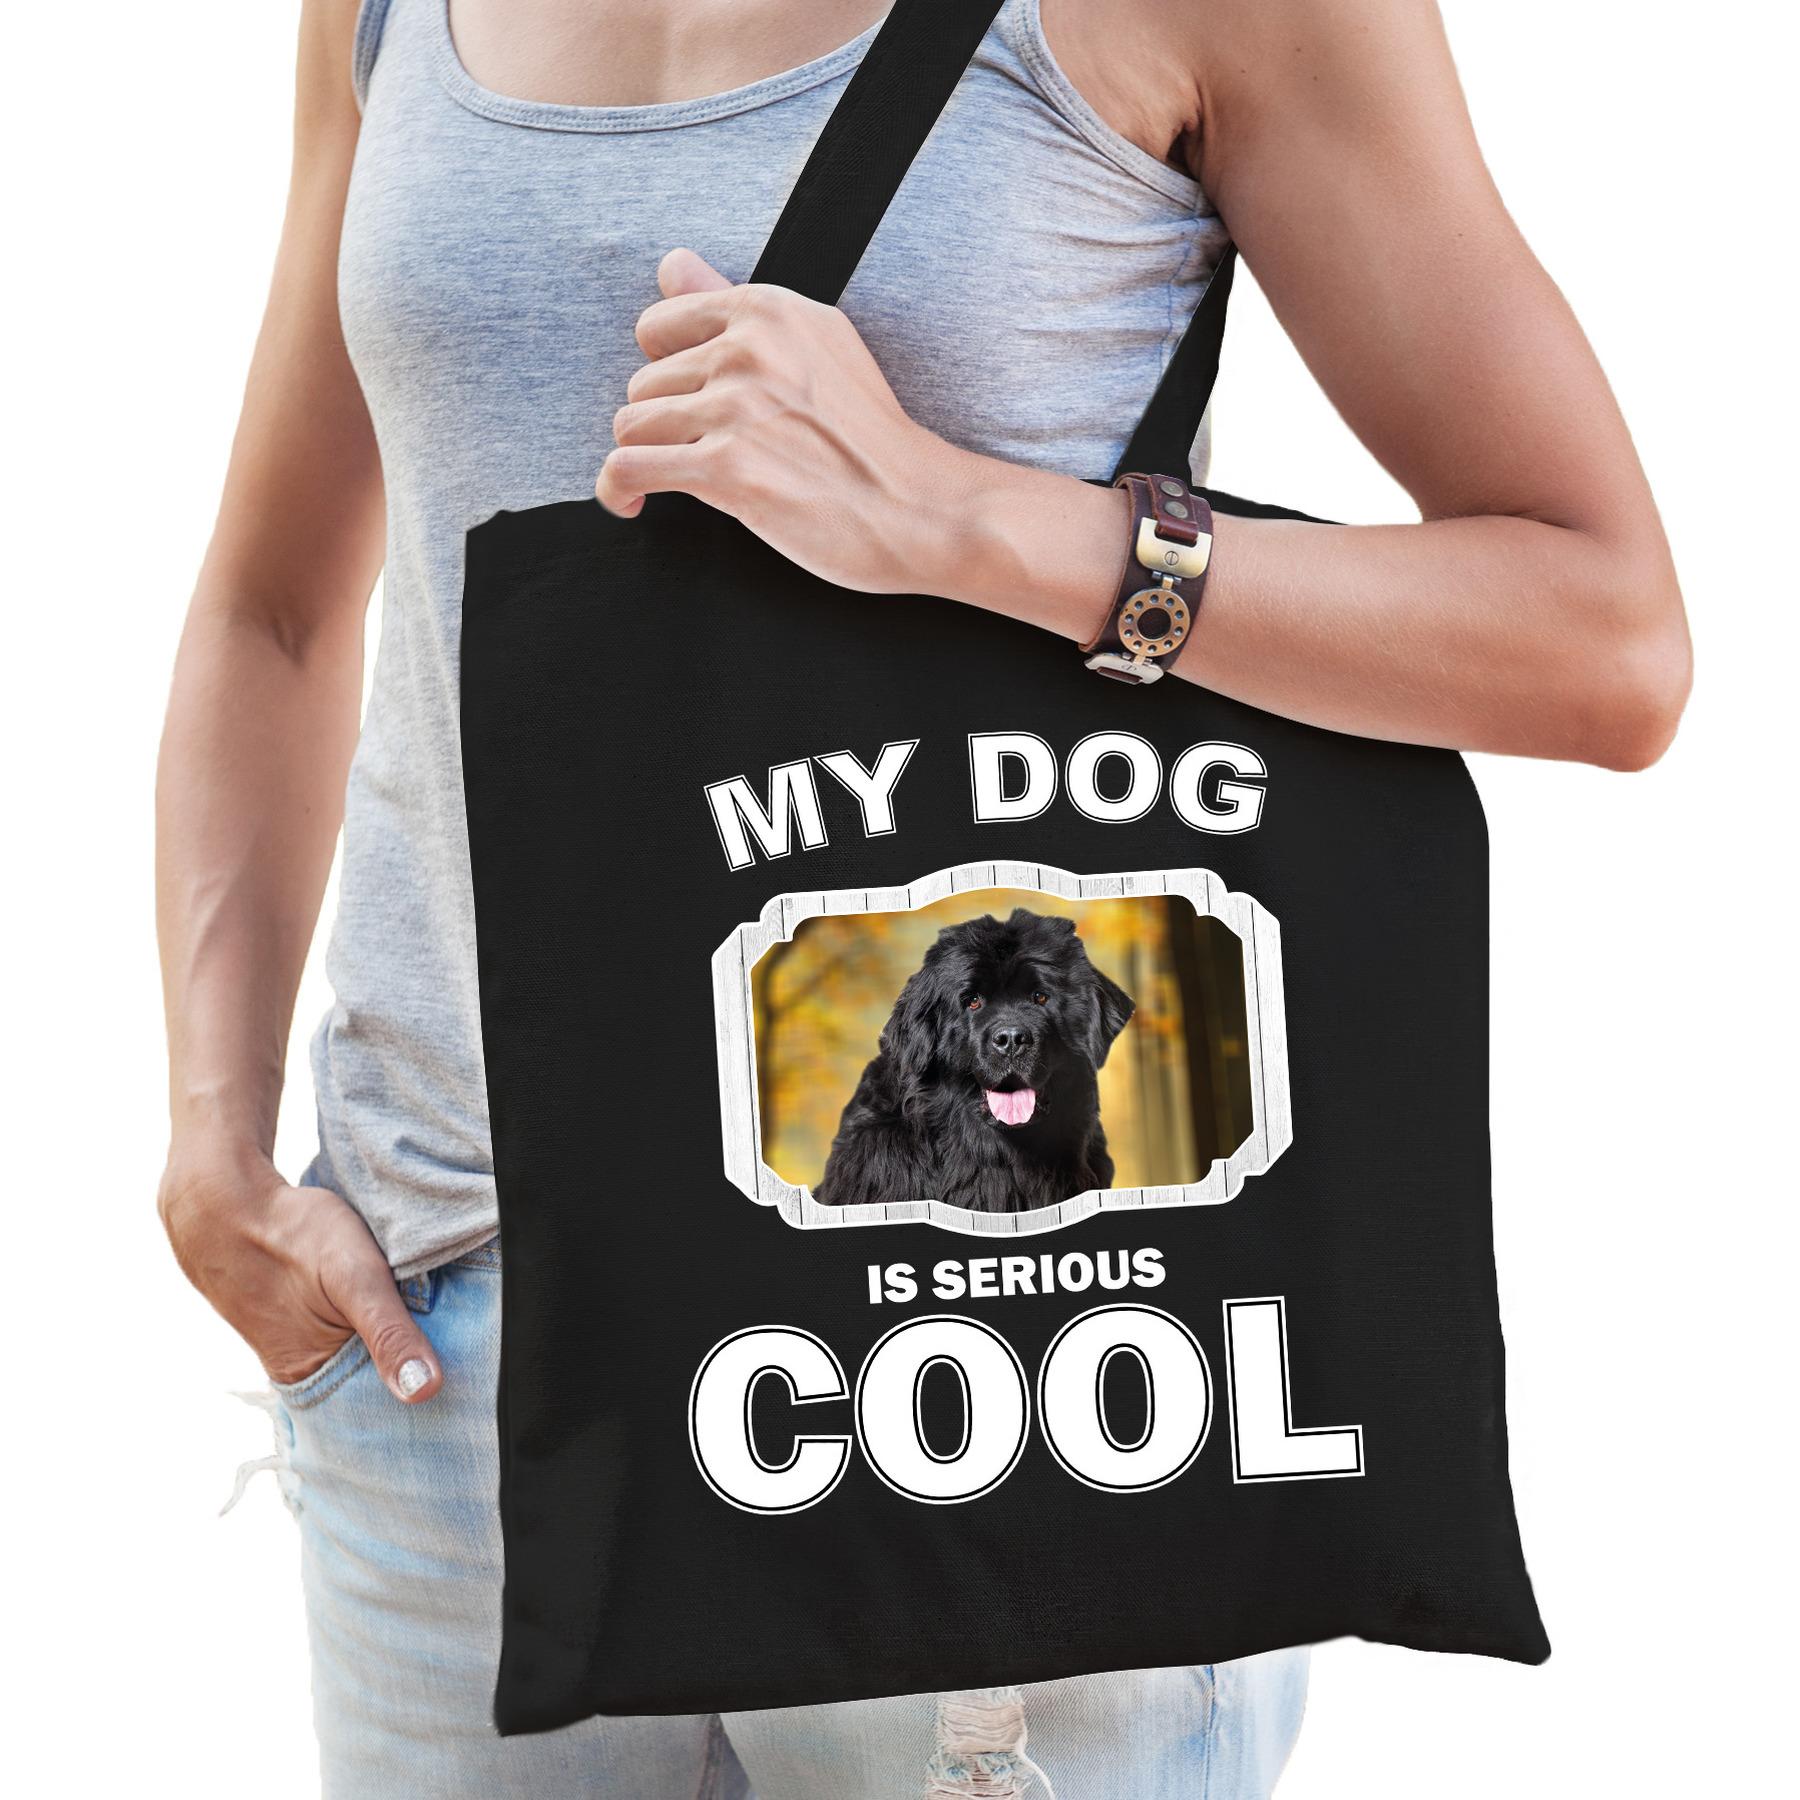 Katoenen tasje my dog is serious cool zwart - Newfoundlander honden cadeau tas